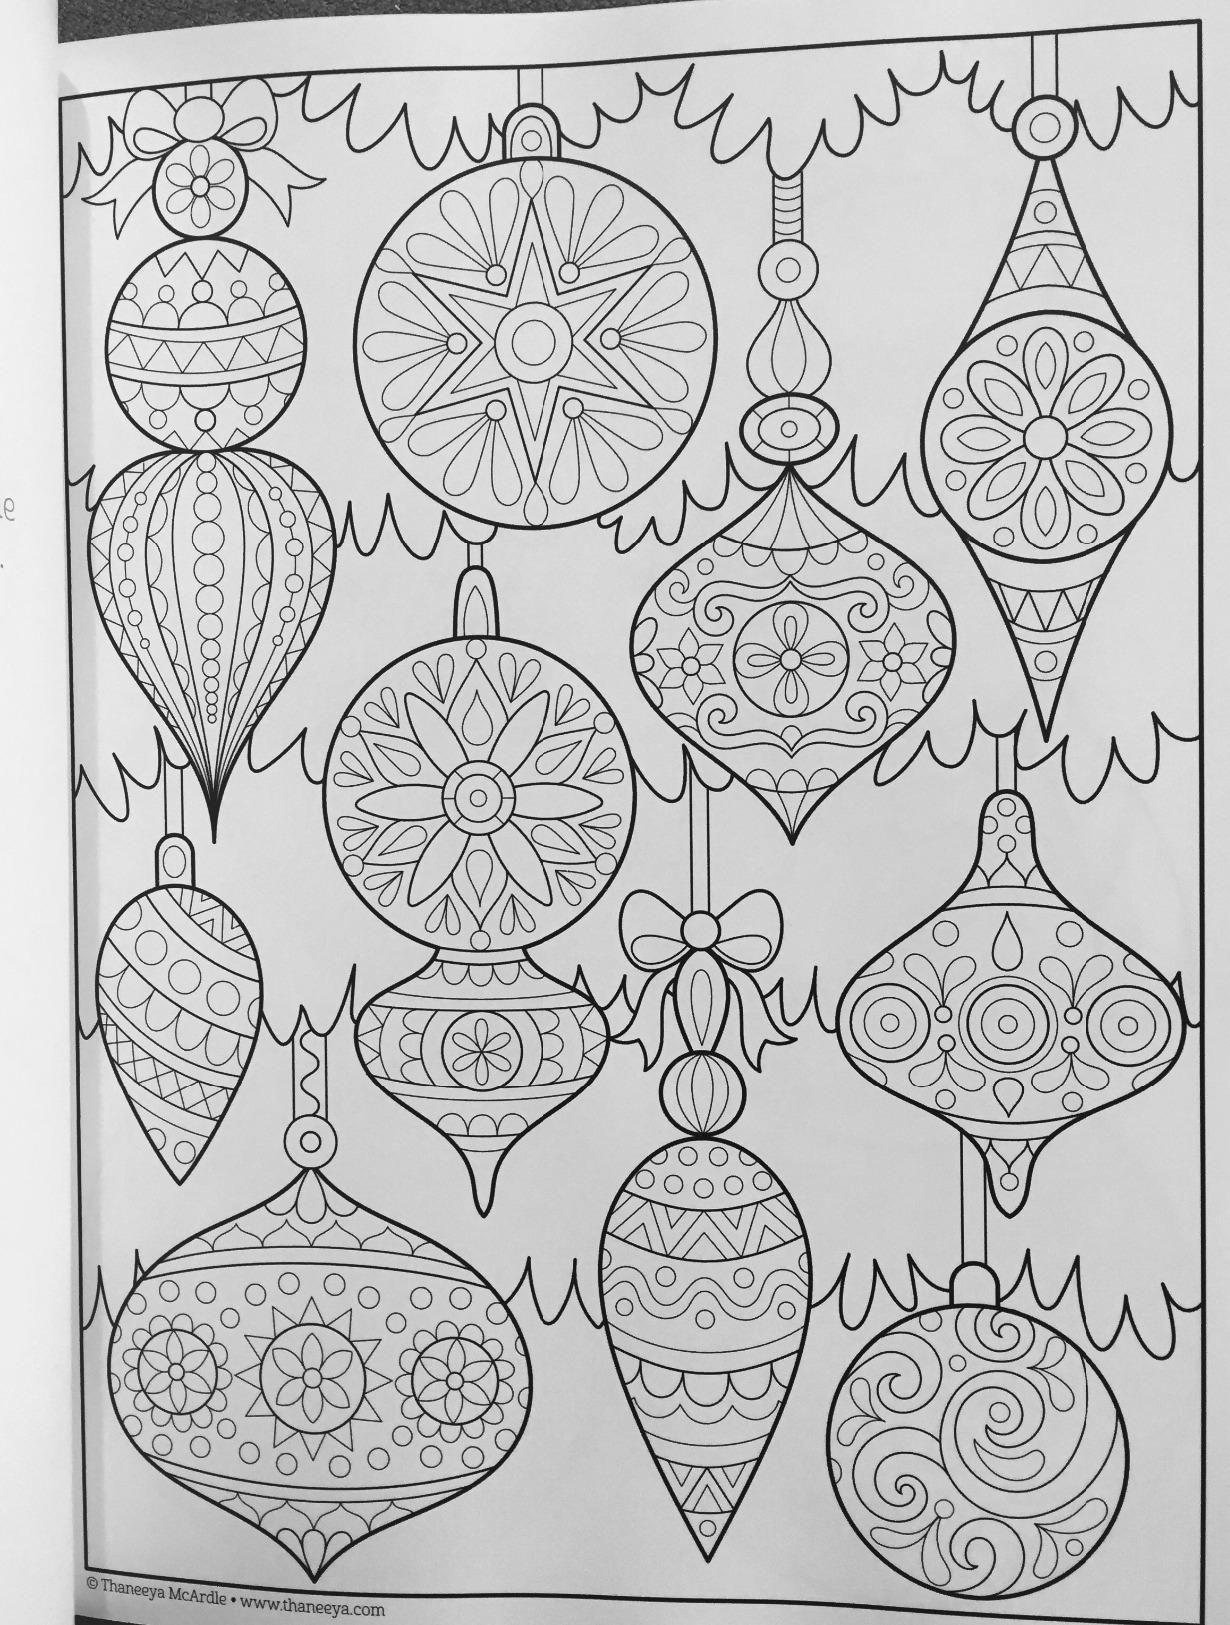 Christmas Coloring Book Is Fun Thaneeya McArdle 9781497200807 Amazon